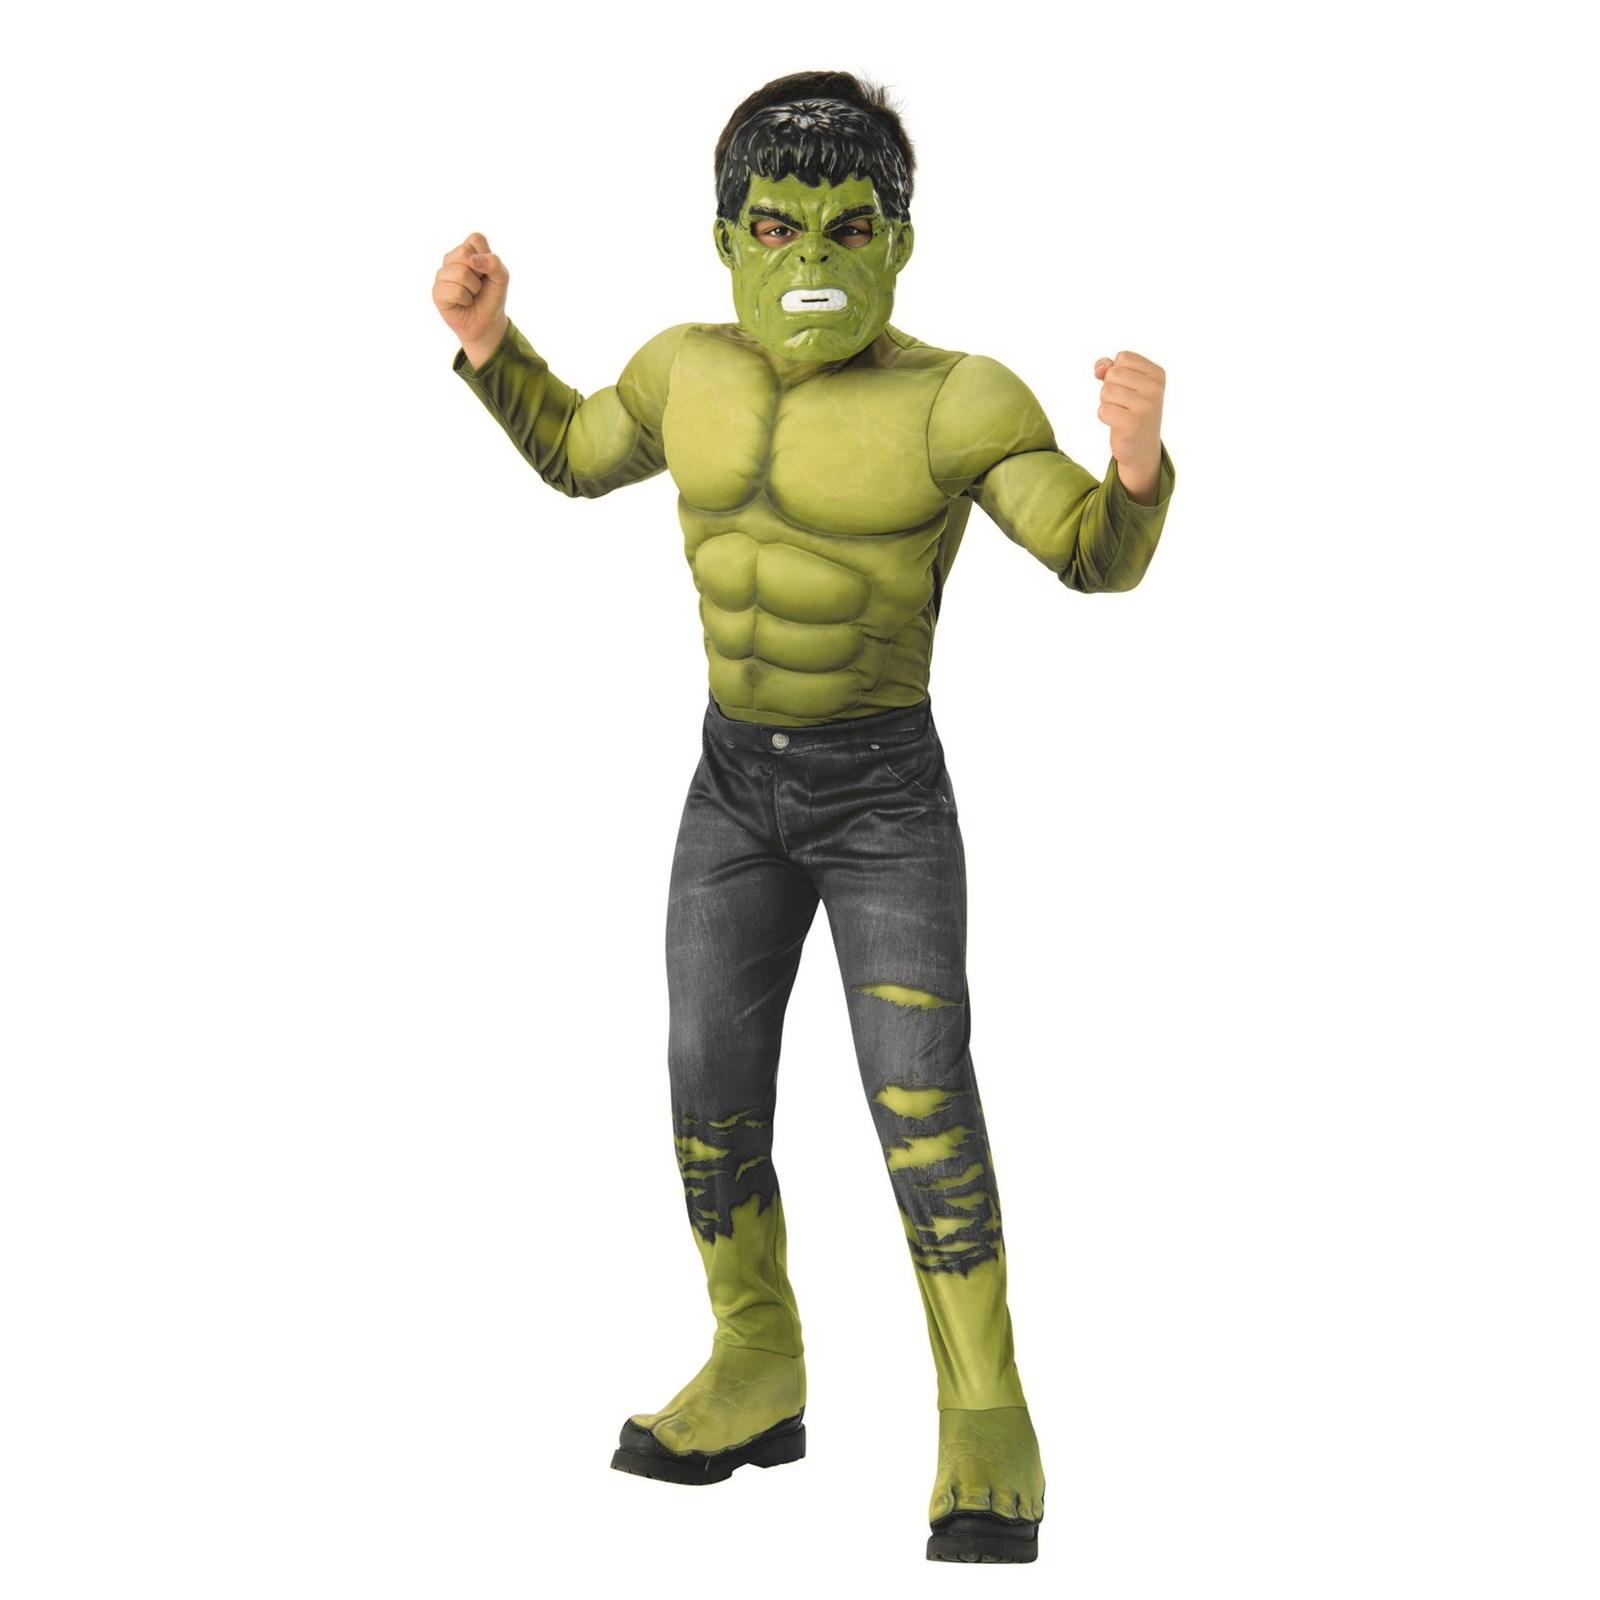 Marvel Avengers Infinity War Hulk Deluxe Boys Halloween Costume